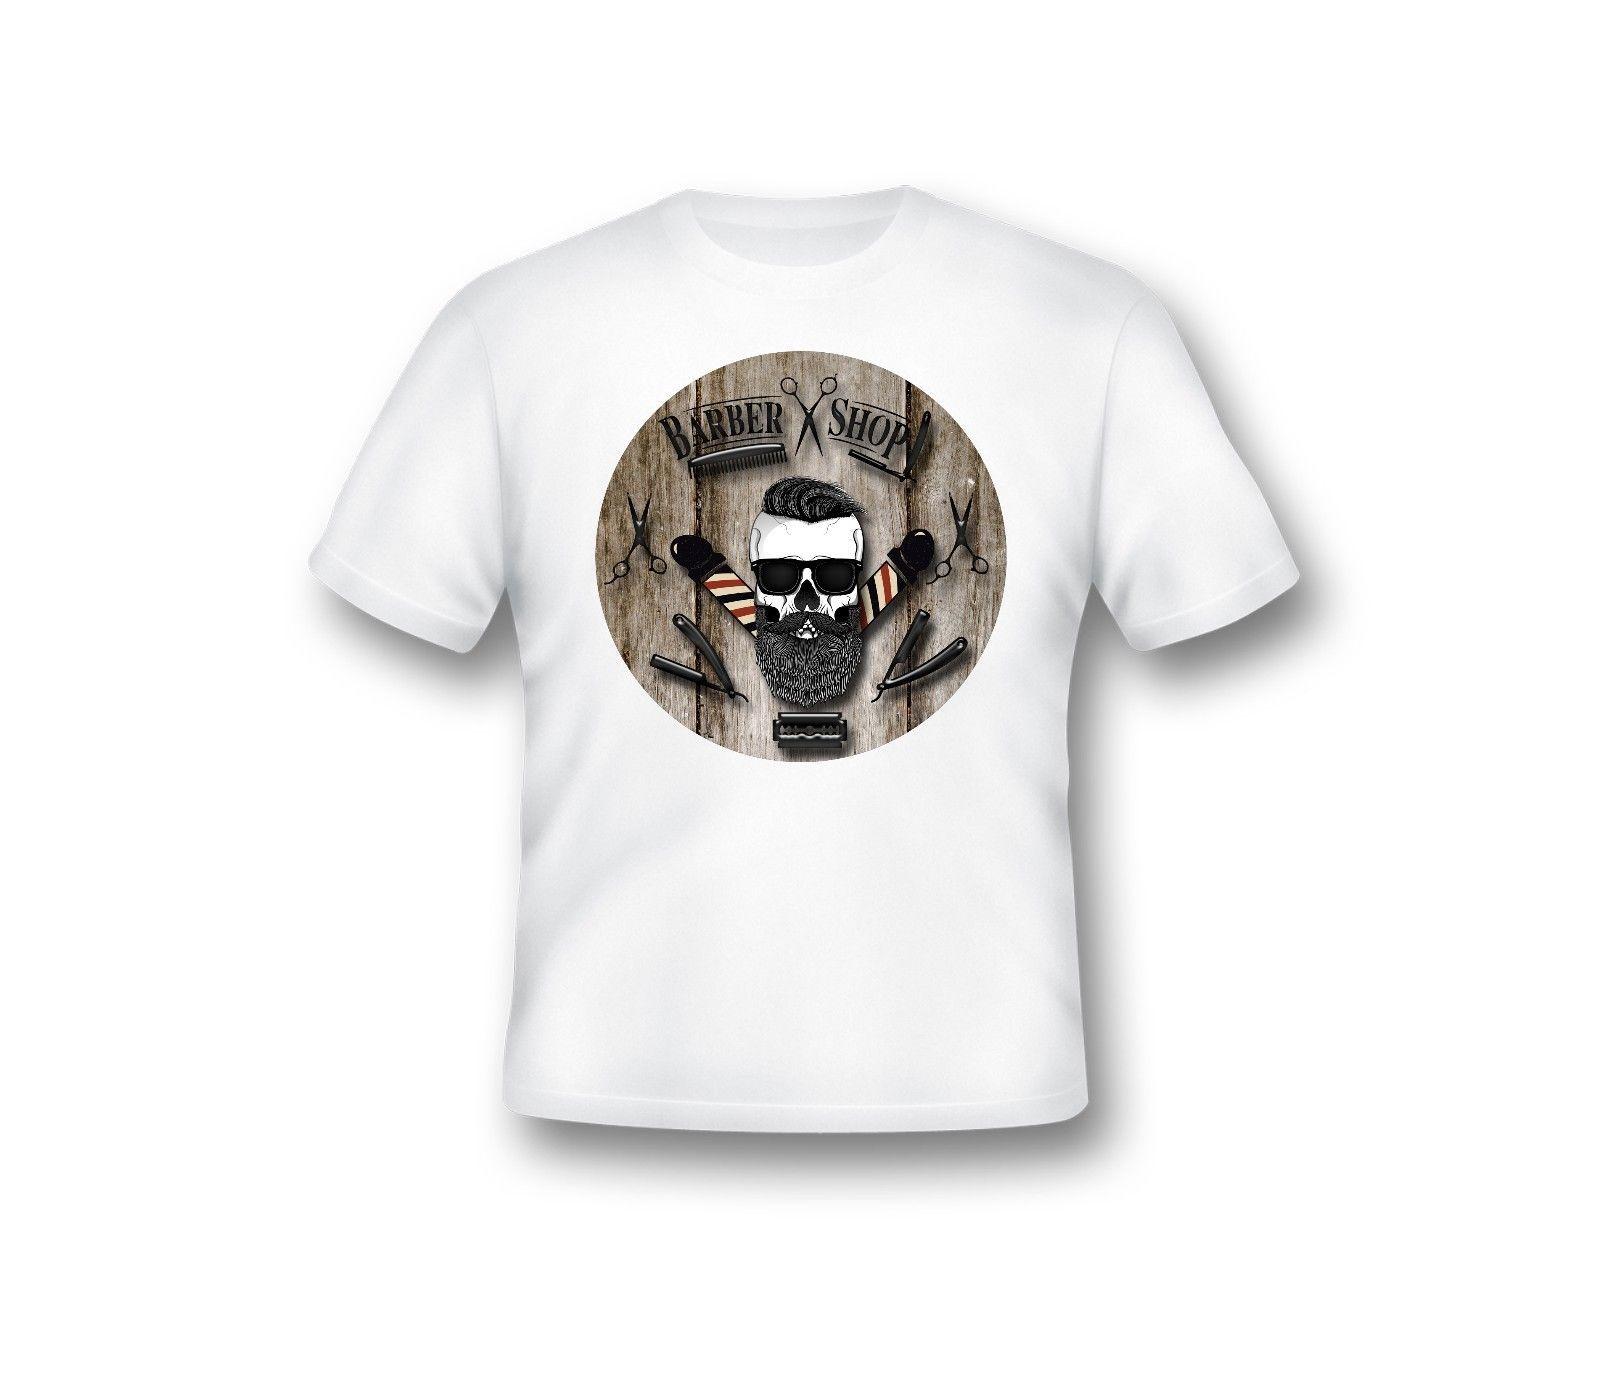 Salon de Coiffure T-Shirt, modernes Hemd, homme, Barber vêtement, 64